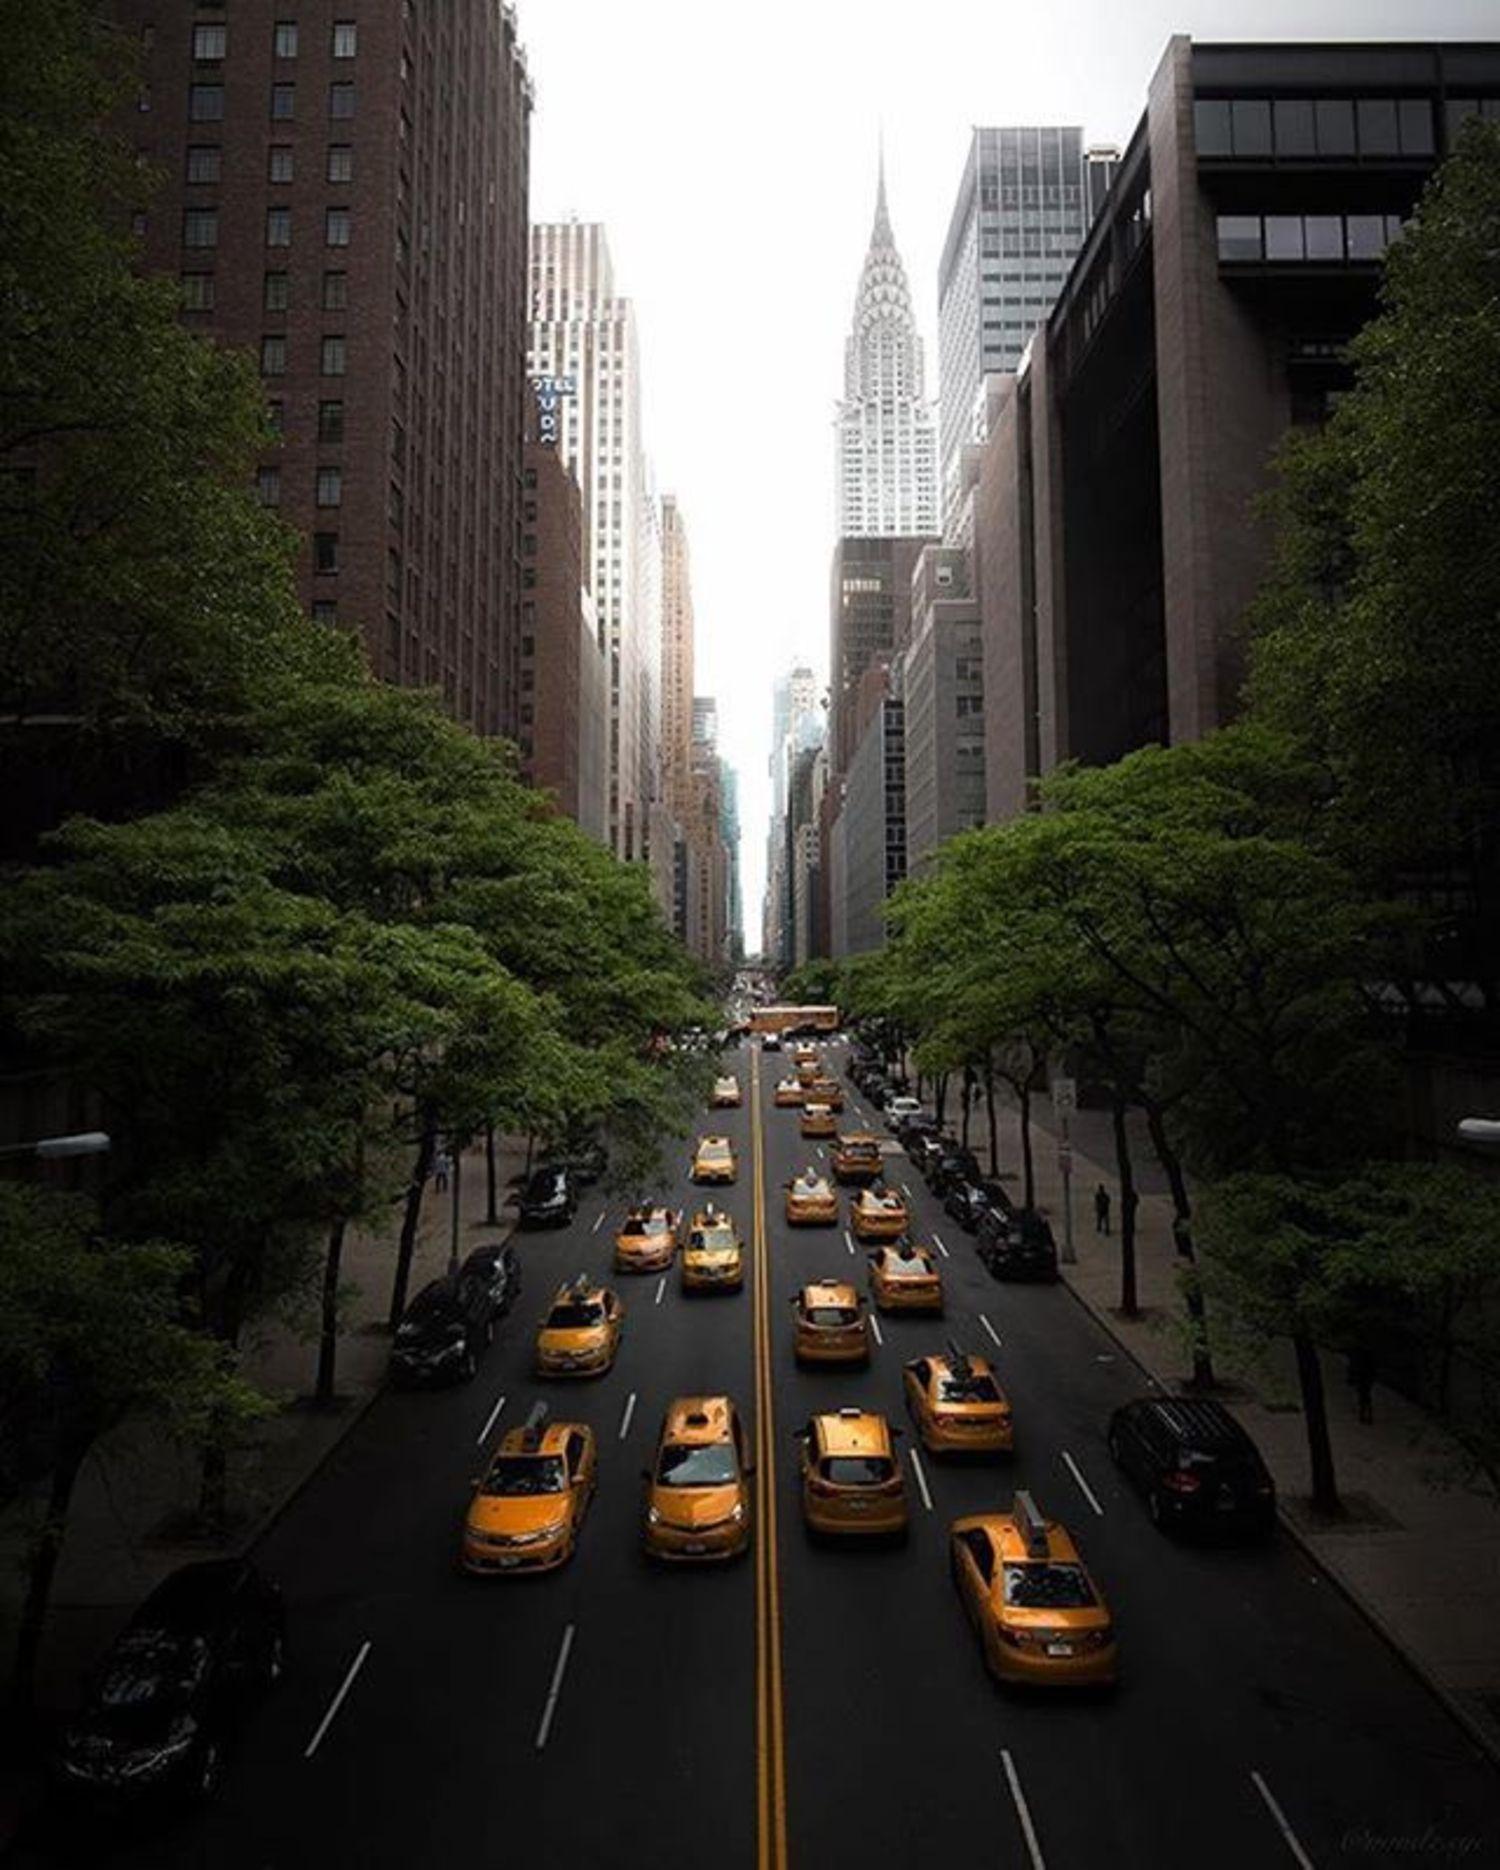 42nd Street from Tudor City Bridge. Photo via @mindz.eye #viewingnyc